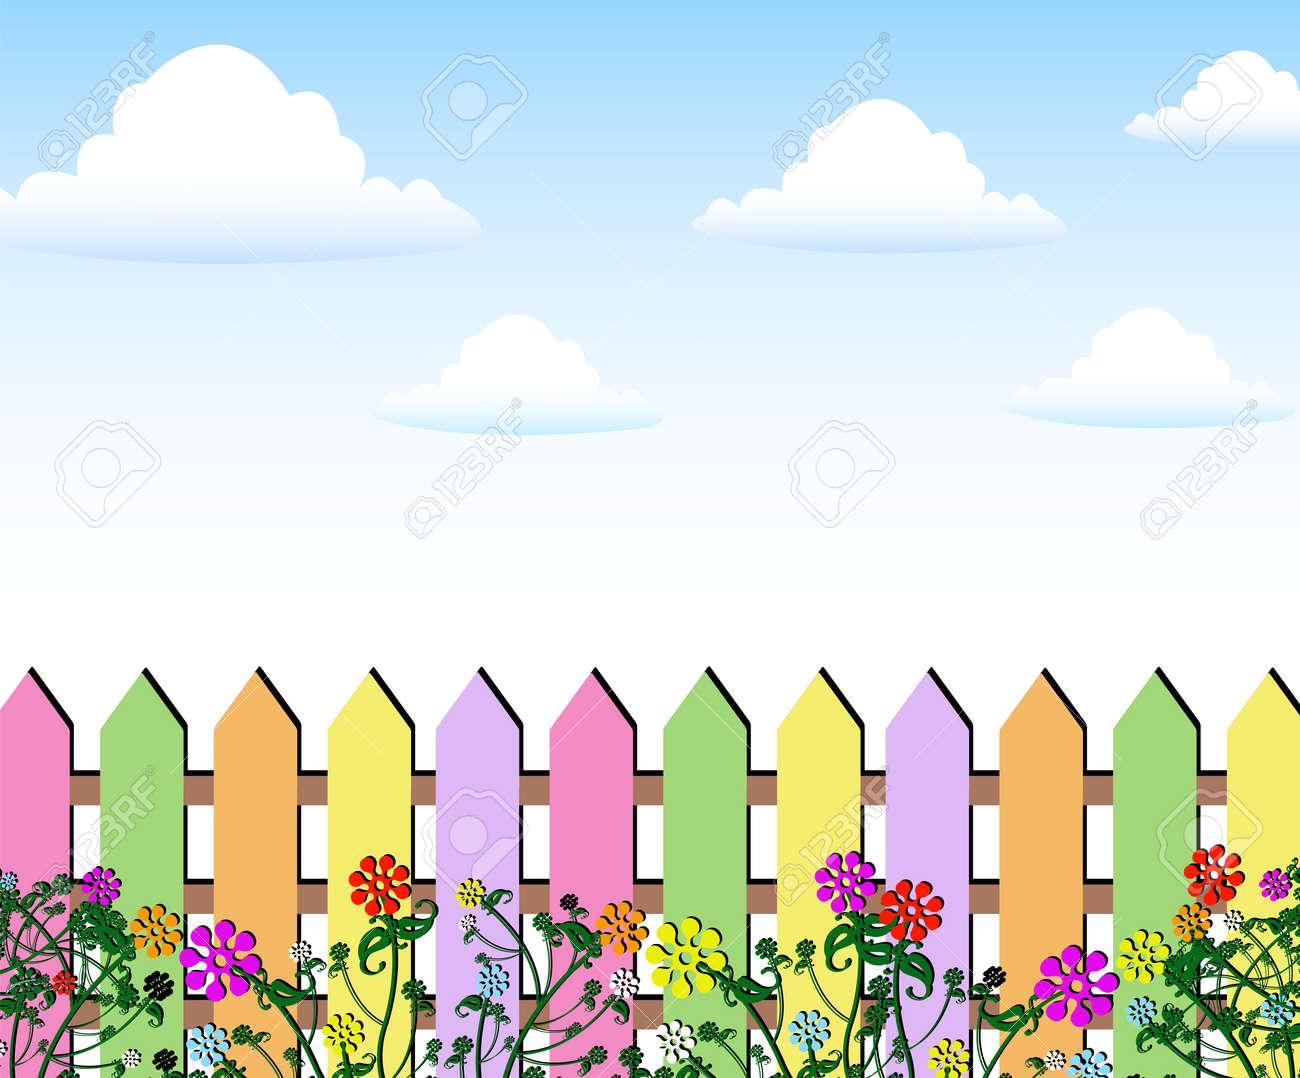 Spring Flower clipart - Flower, Illustration, Grass, transparent clip art